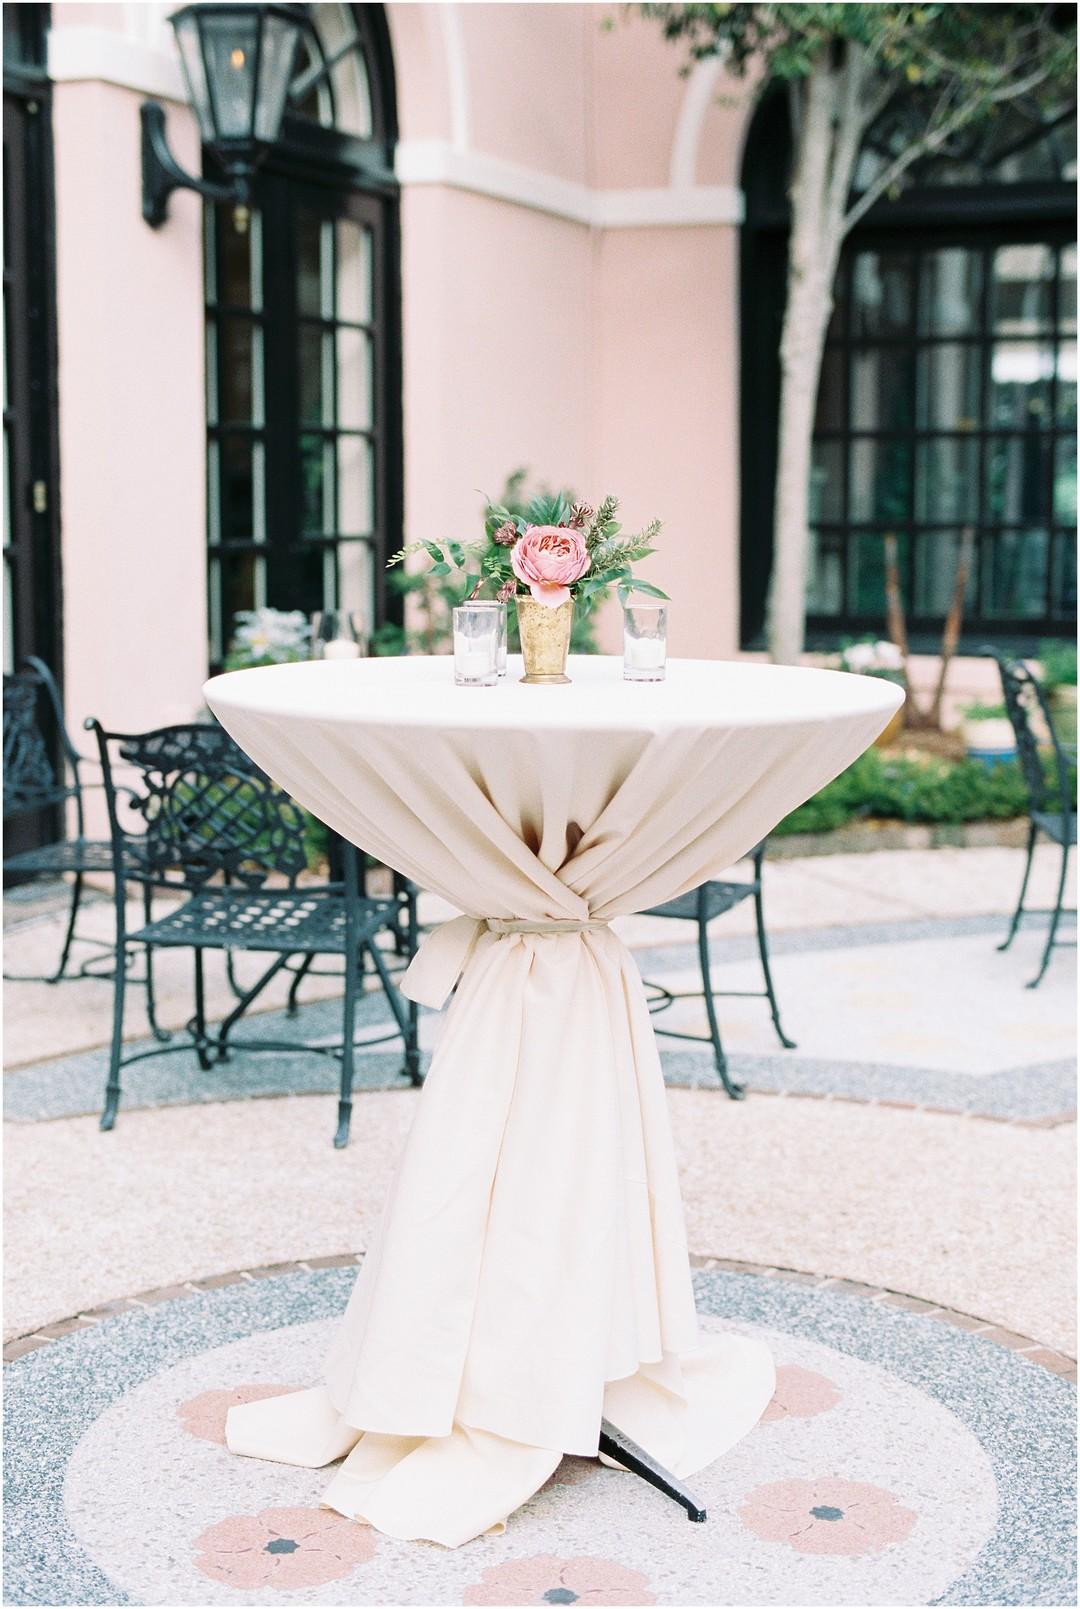 mills-house-hotel-wedding-31.jpg